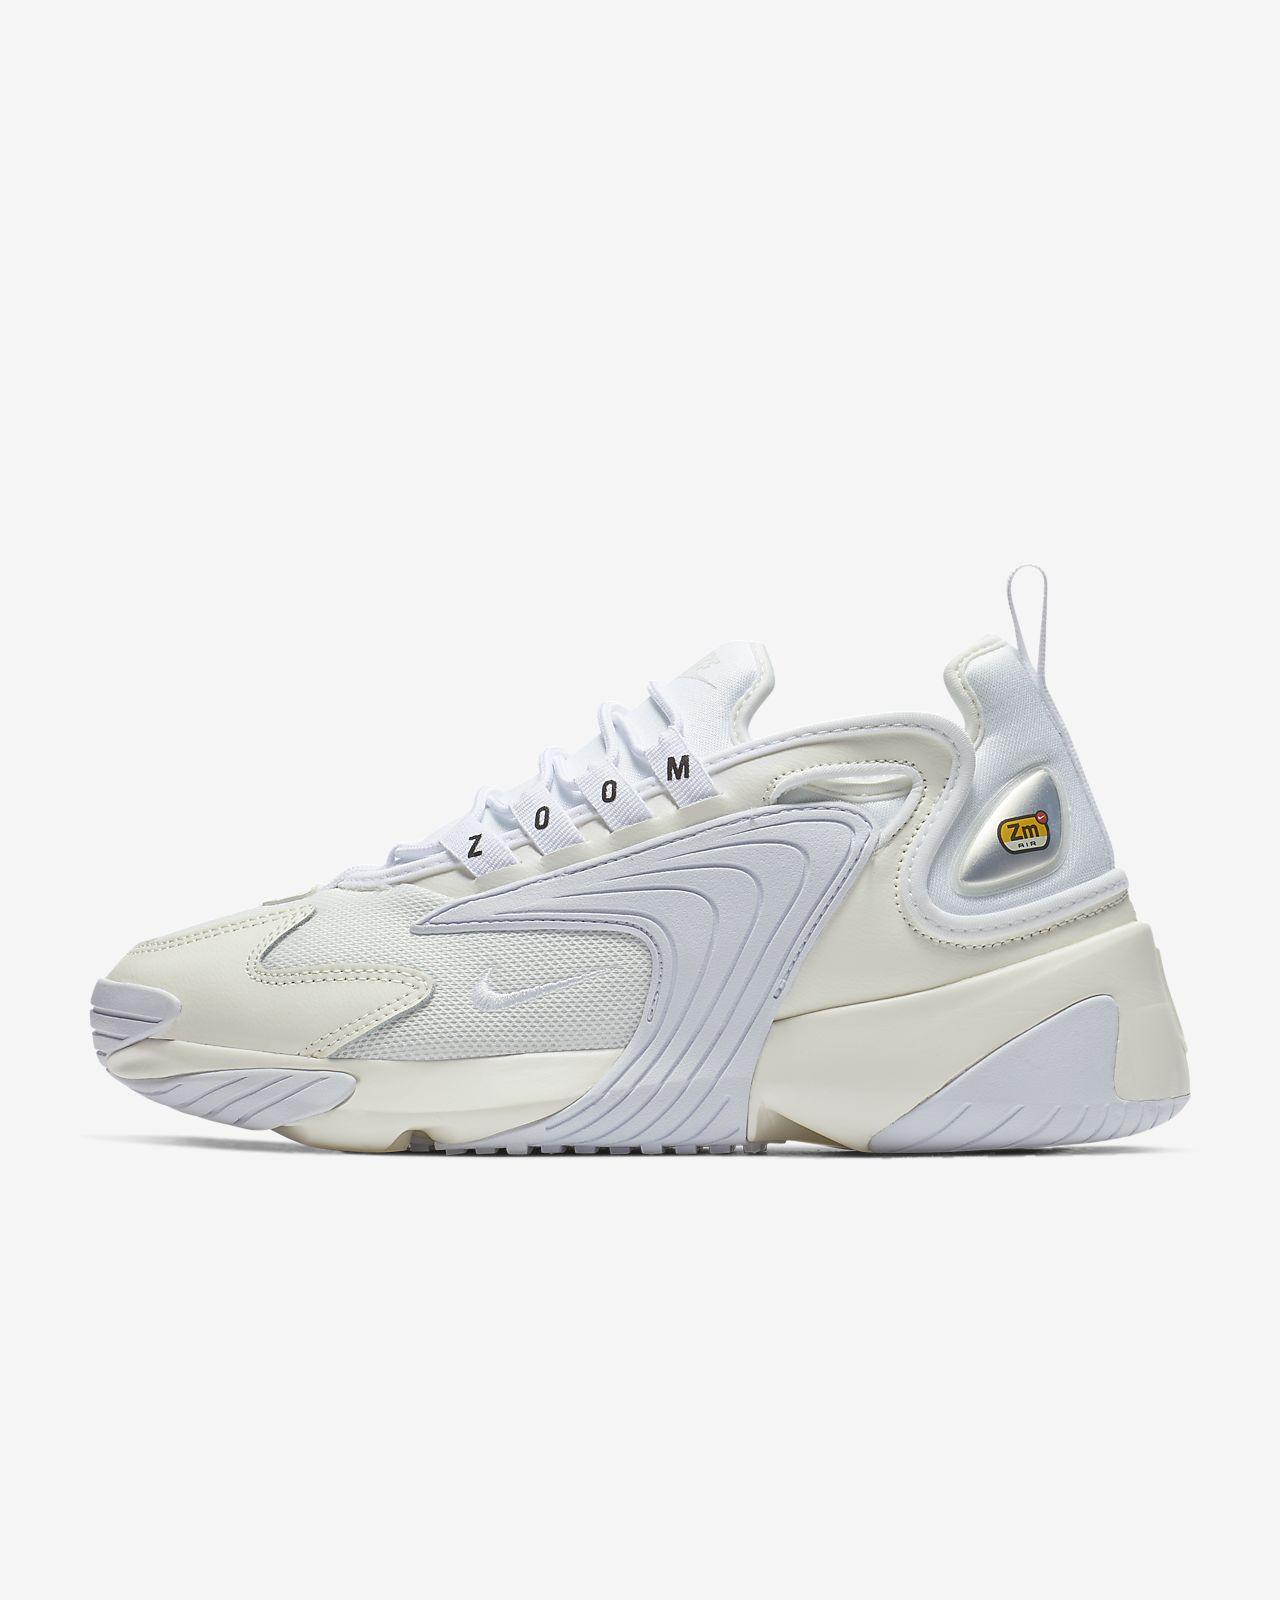 2k Zoom FemmeBe Chaussure Nike Pour ZwOiuTkXP